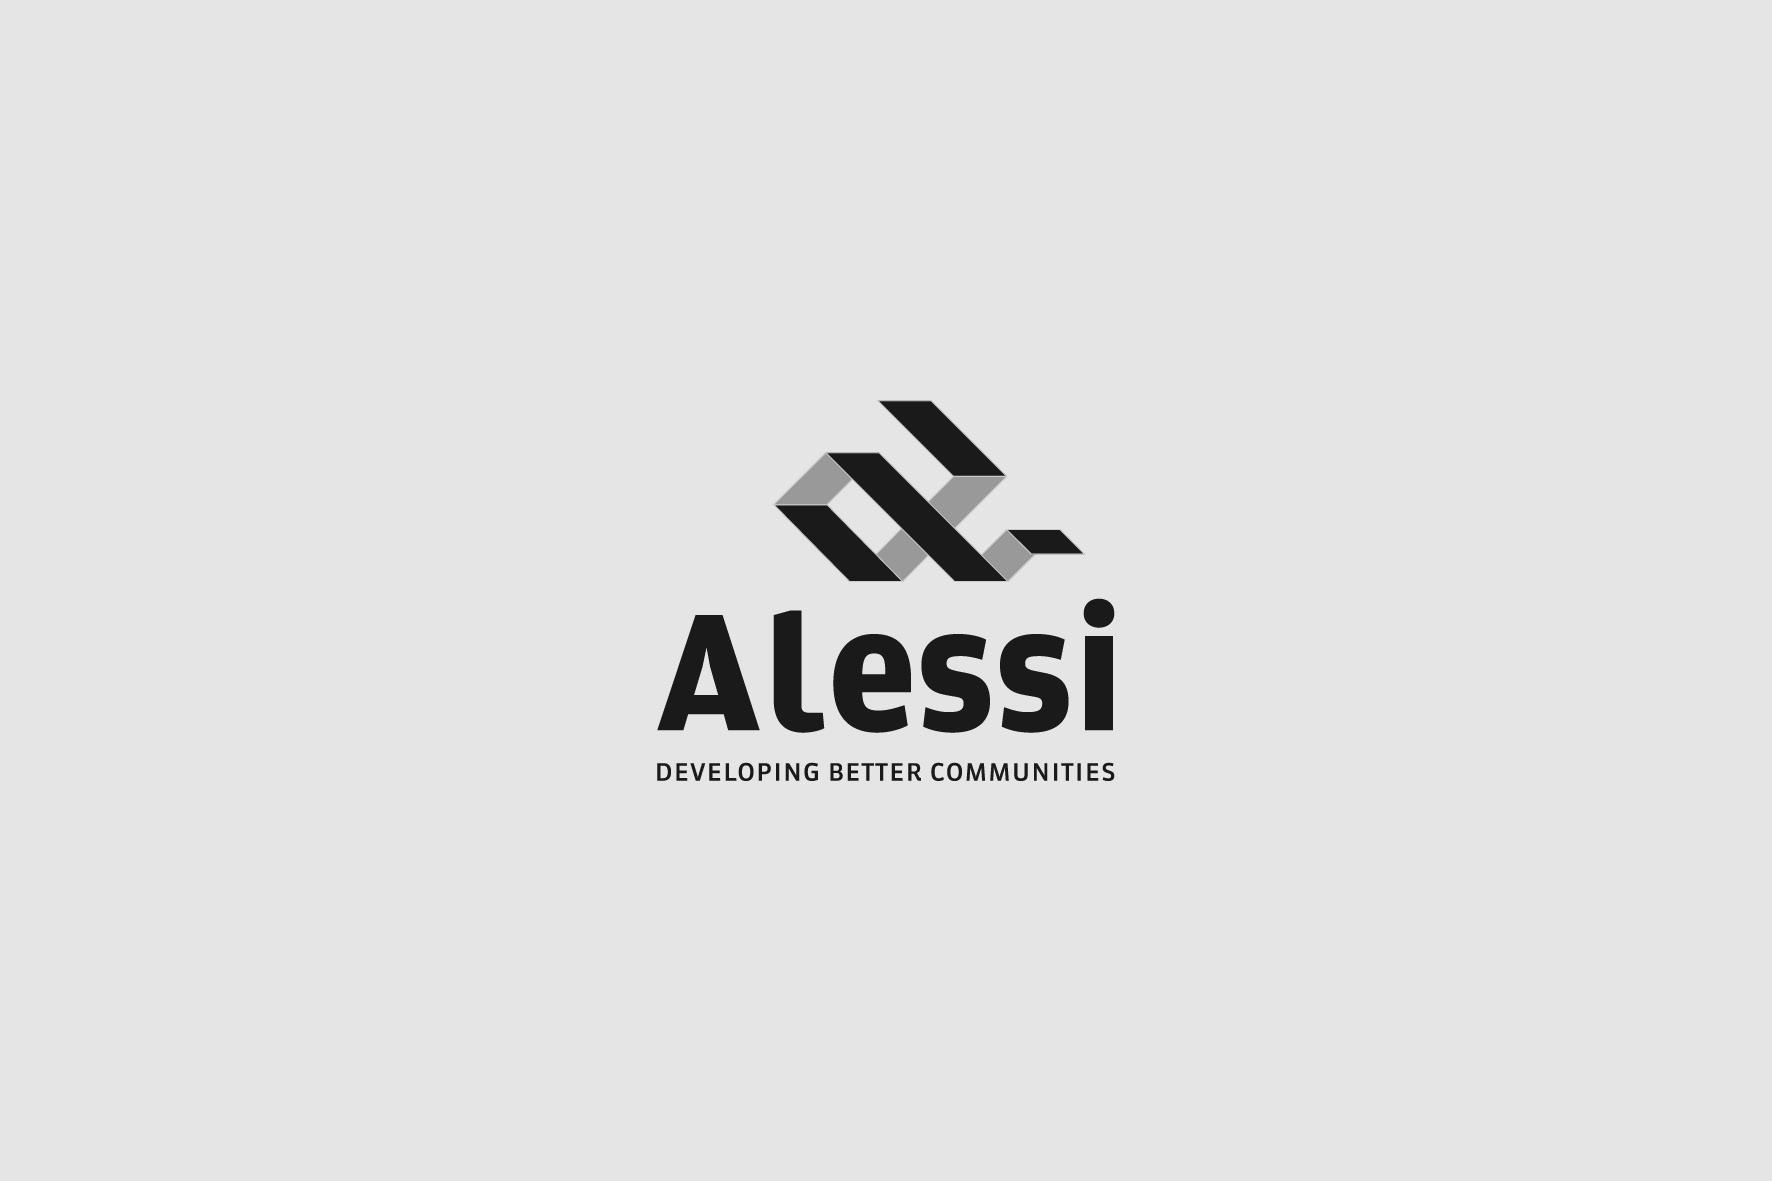 atelier_logotipi